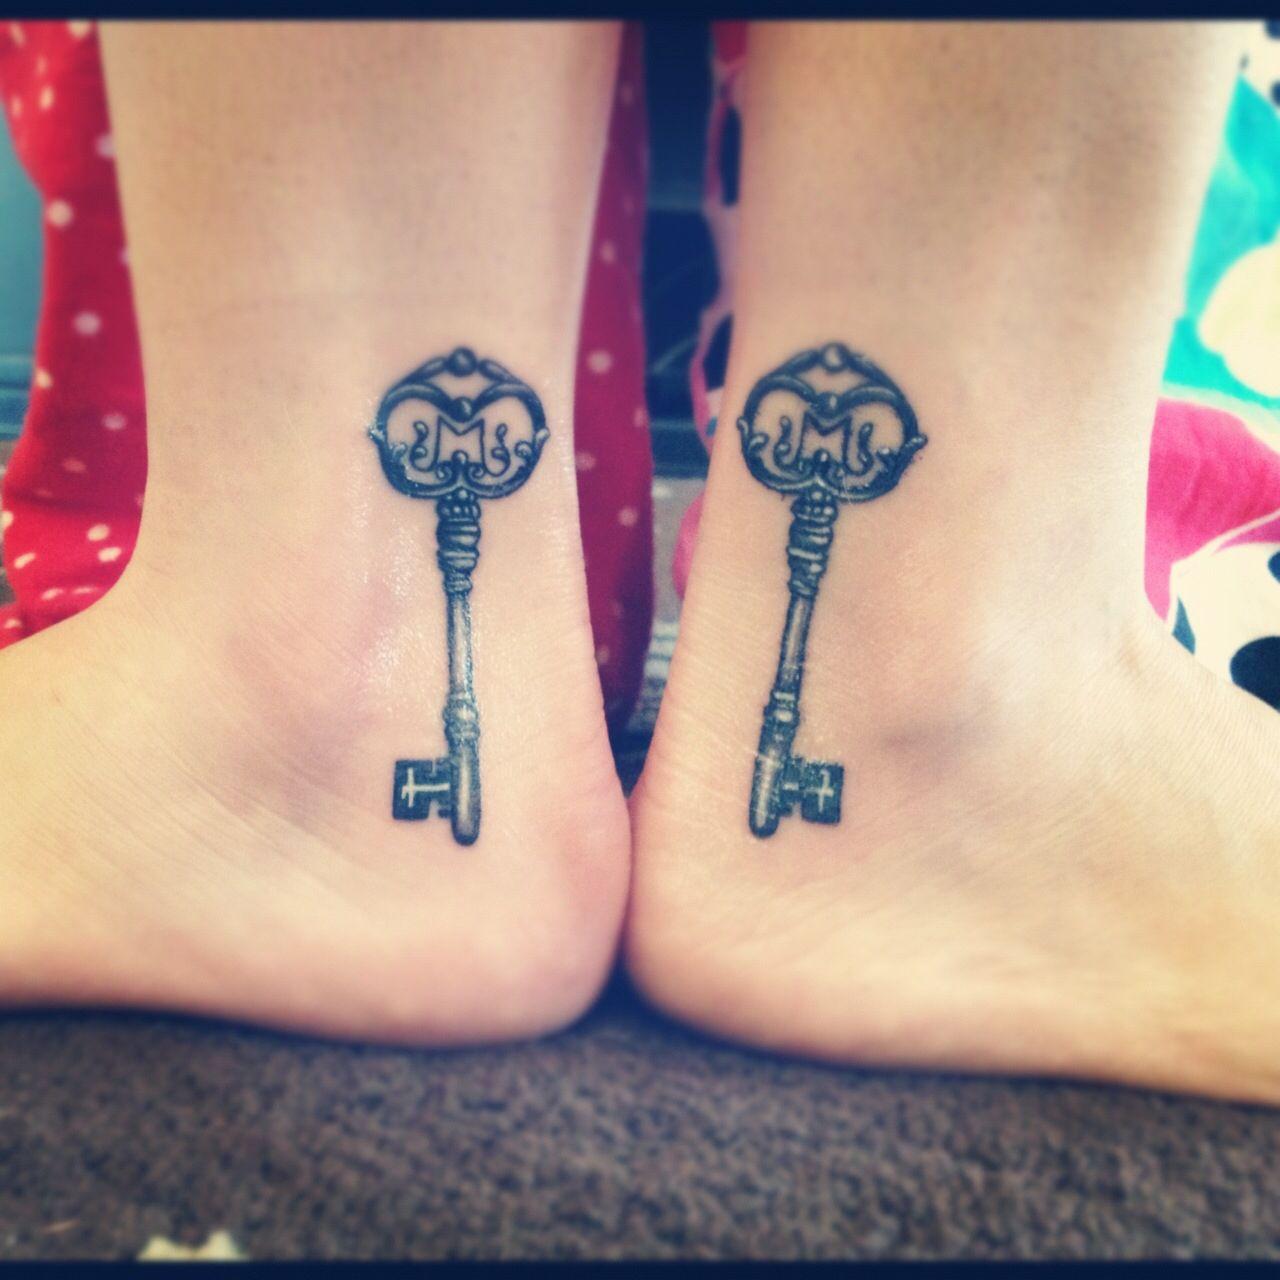 Good ankle tattoo ideas image from ndyourtattoowpcontentuploads